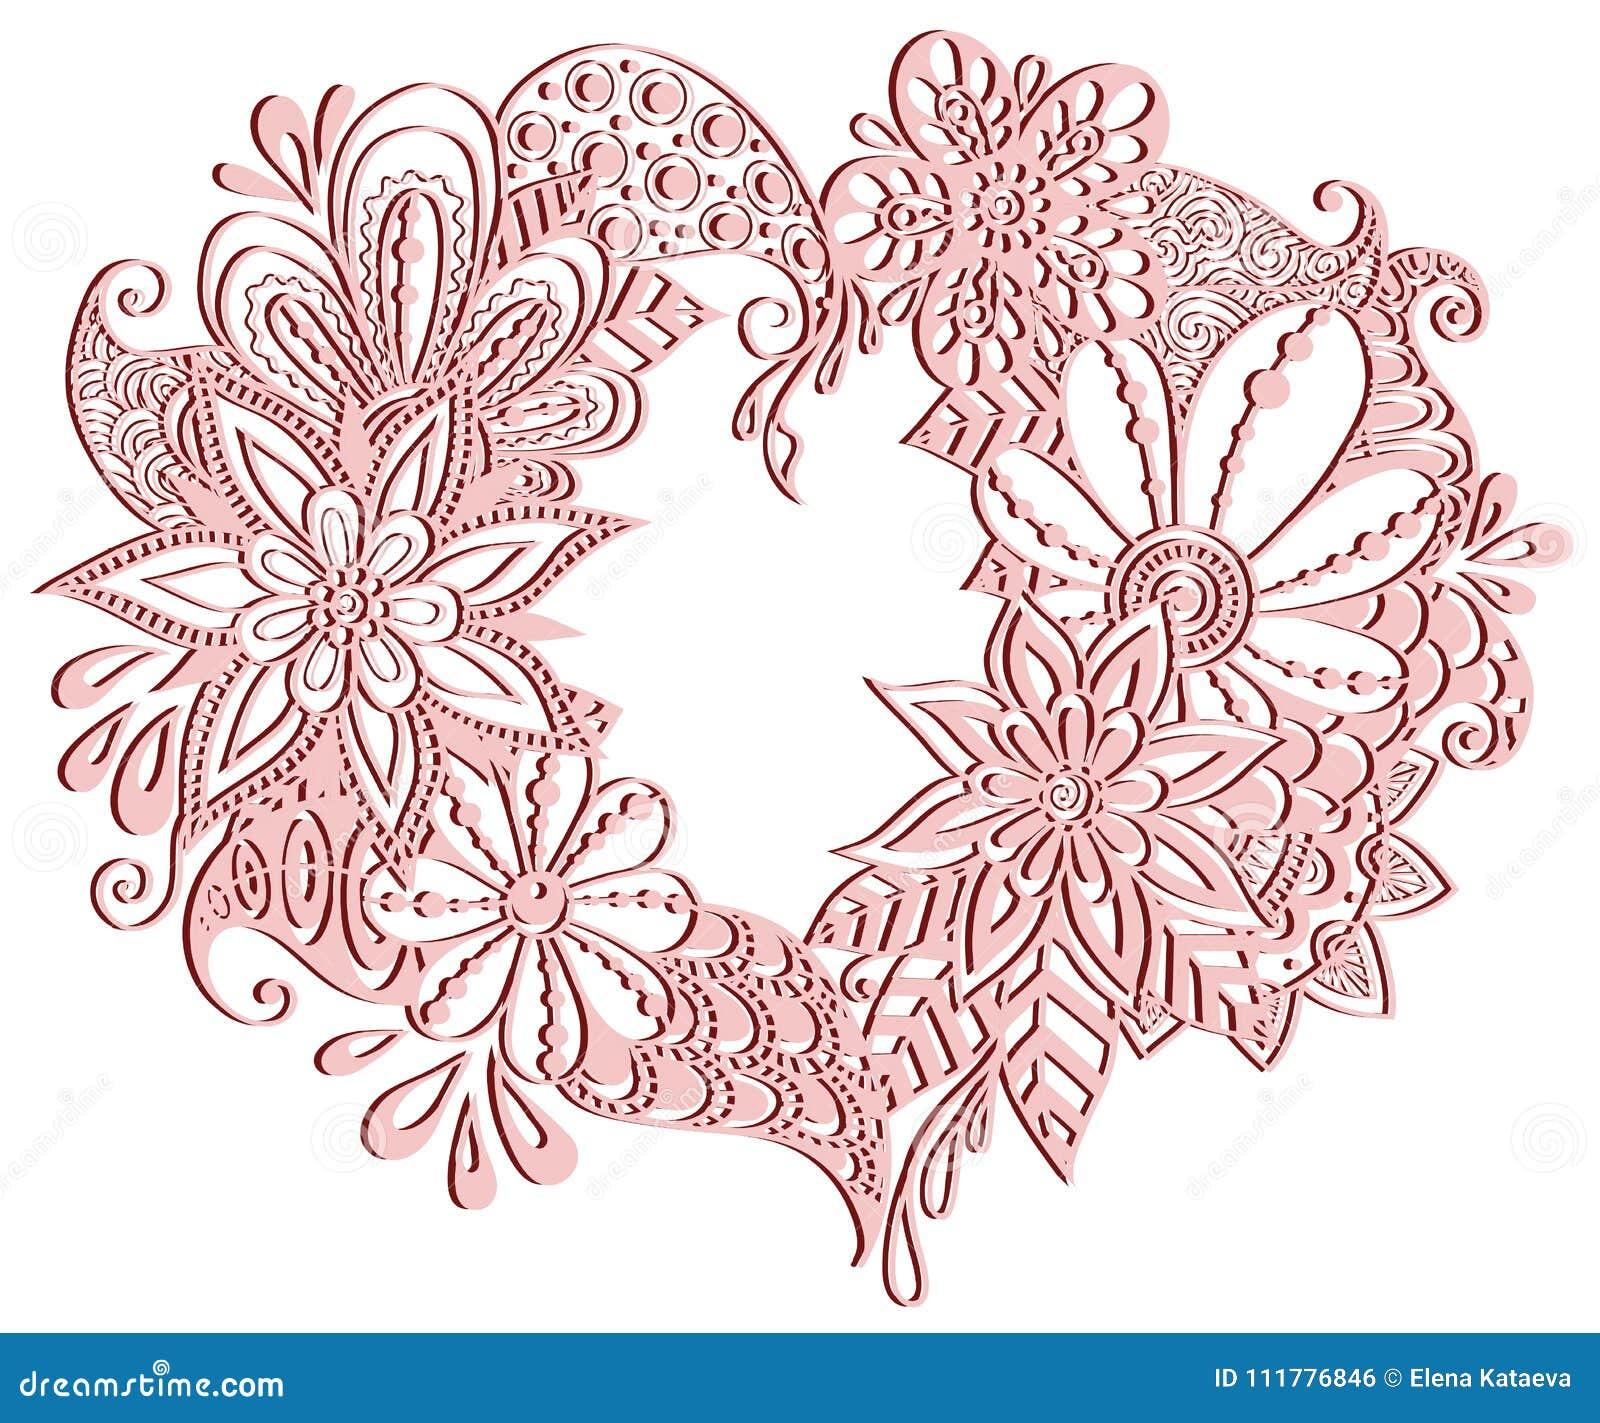 Floral heart. Monochrome pink vector romantic love illustration